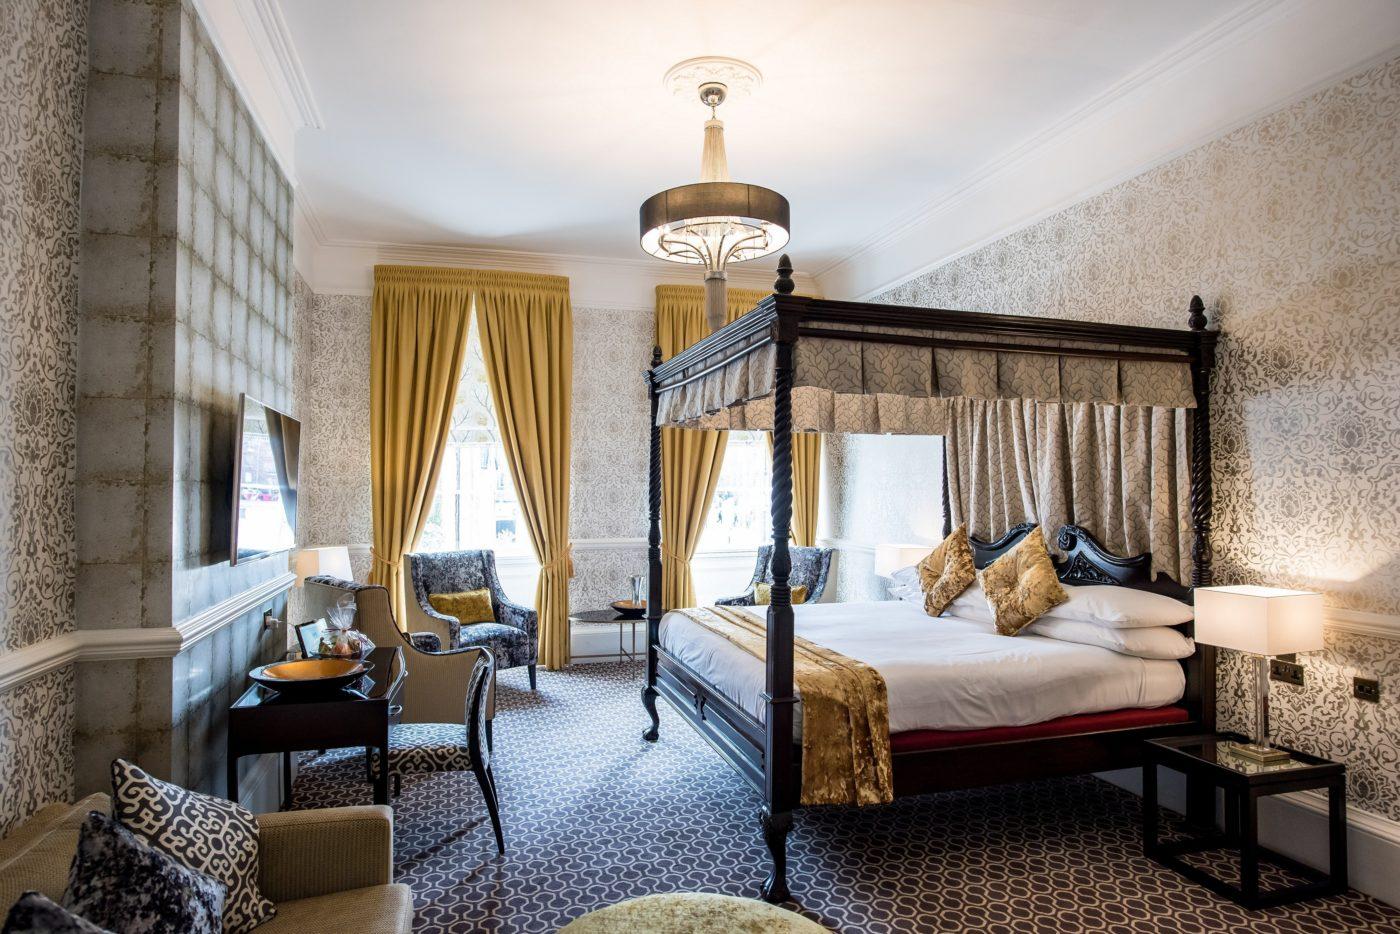 The Paston Suite, Maids Head Hotel